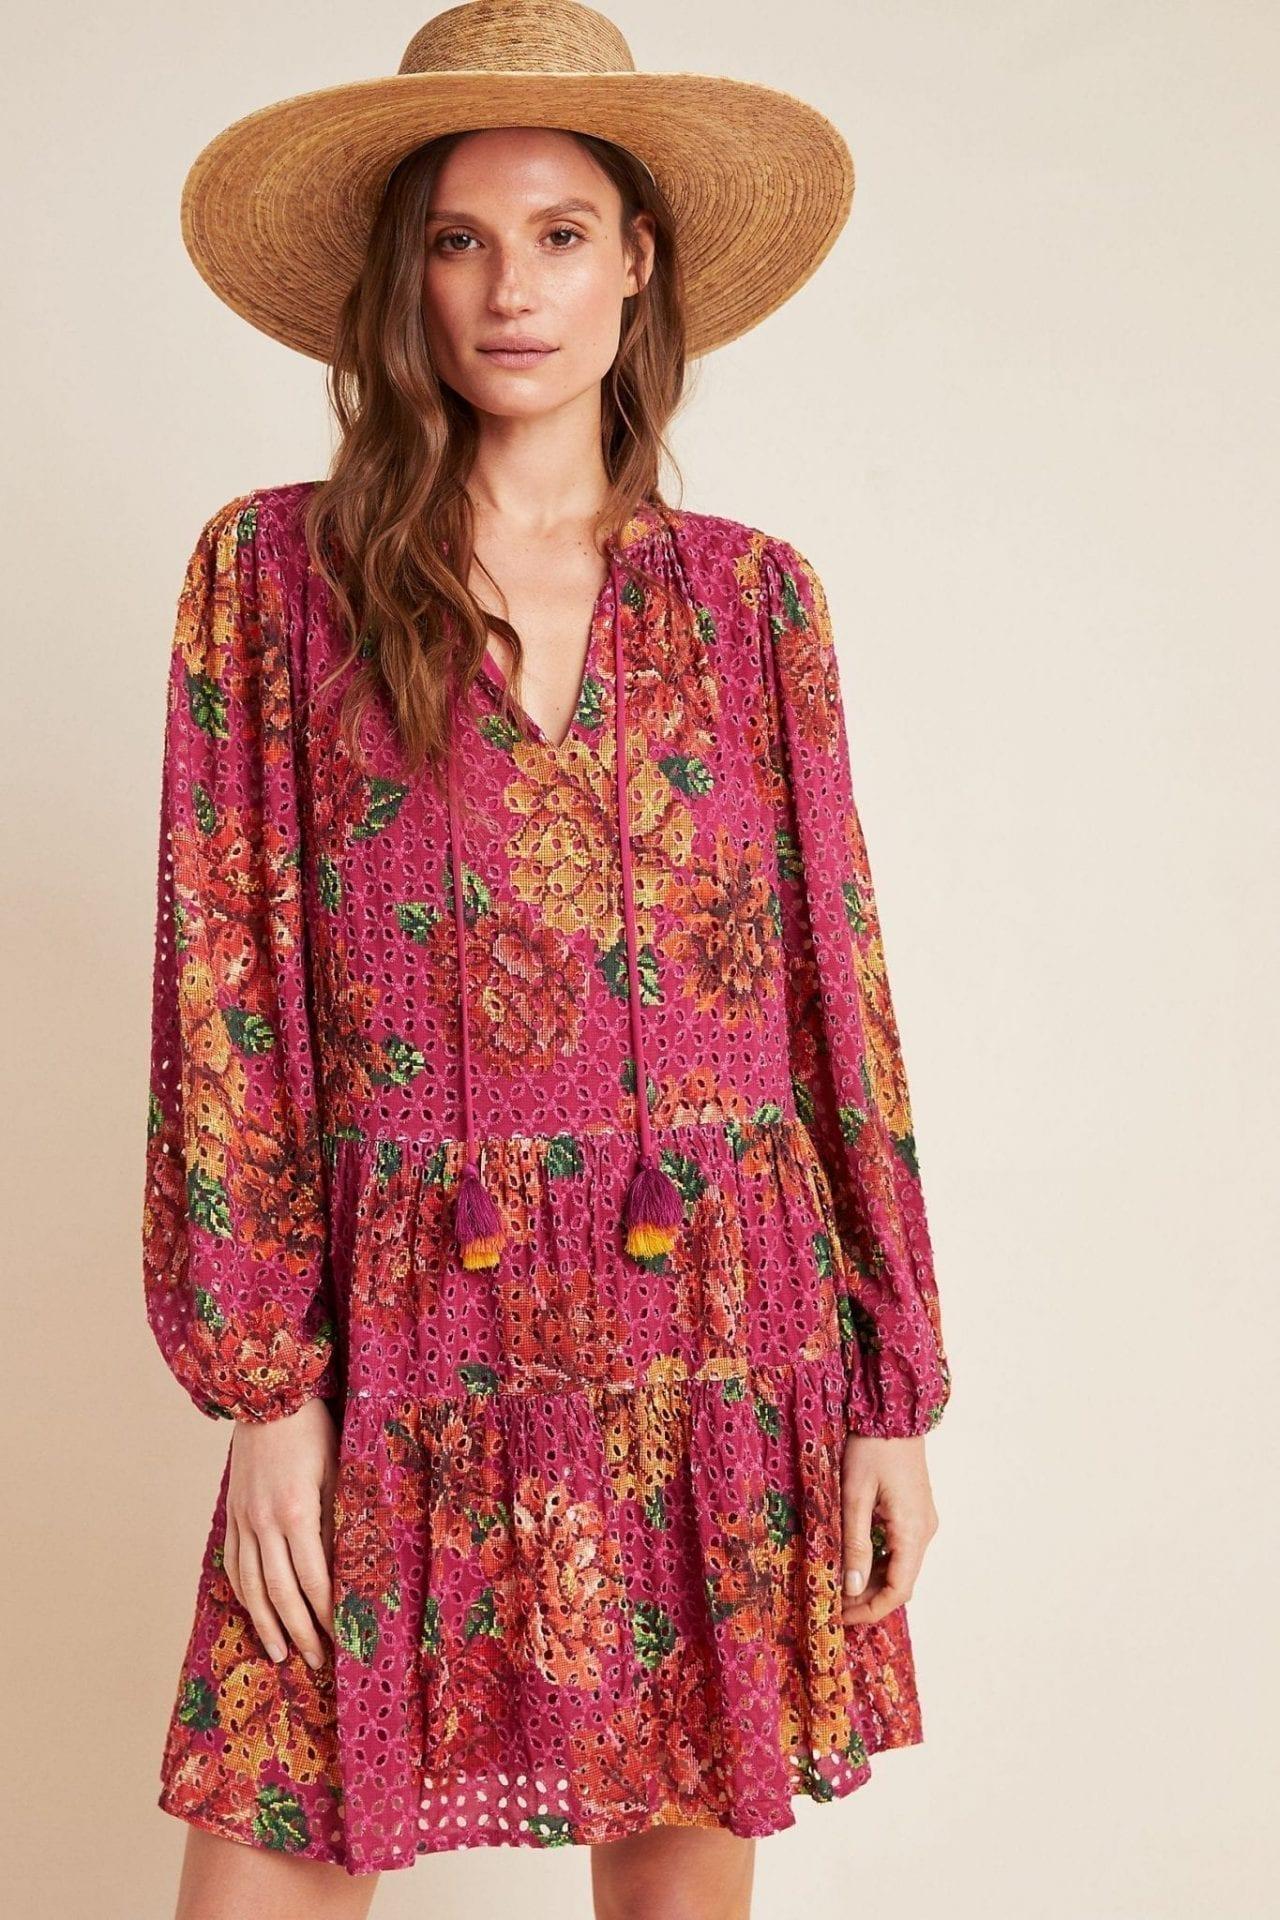 FARM RIO Eyelet Tiered Tunic Dress